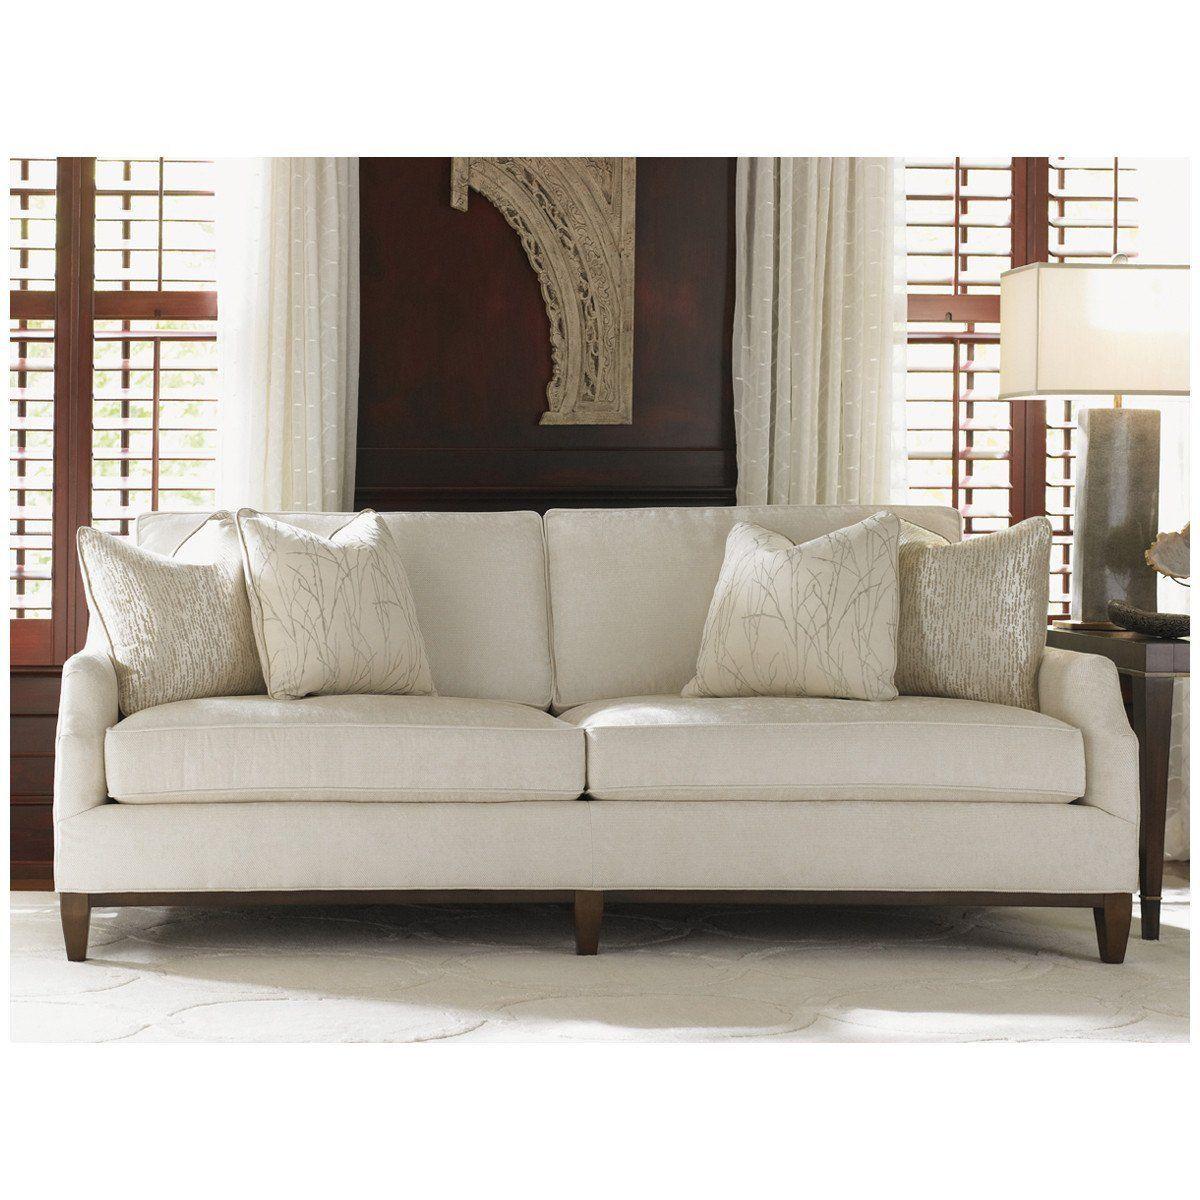 Lexington Tower Place Conrad Sofa | Lexington furniture ...